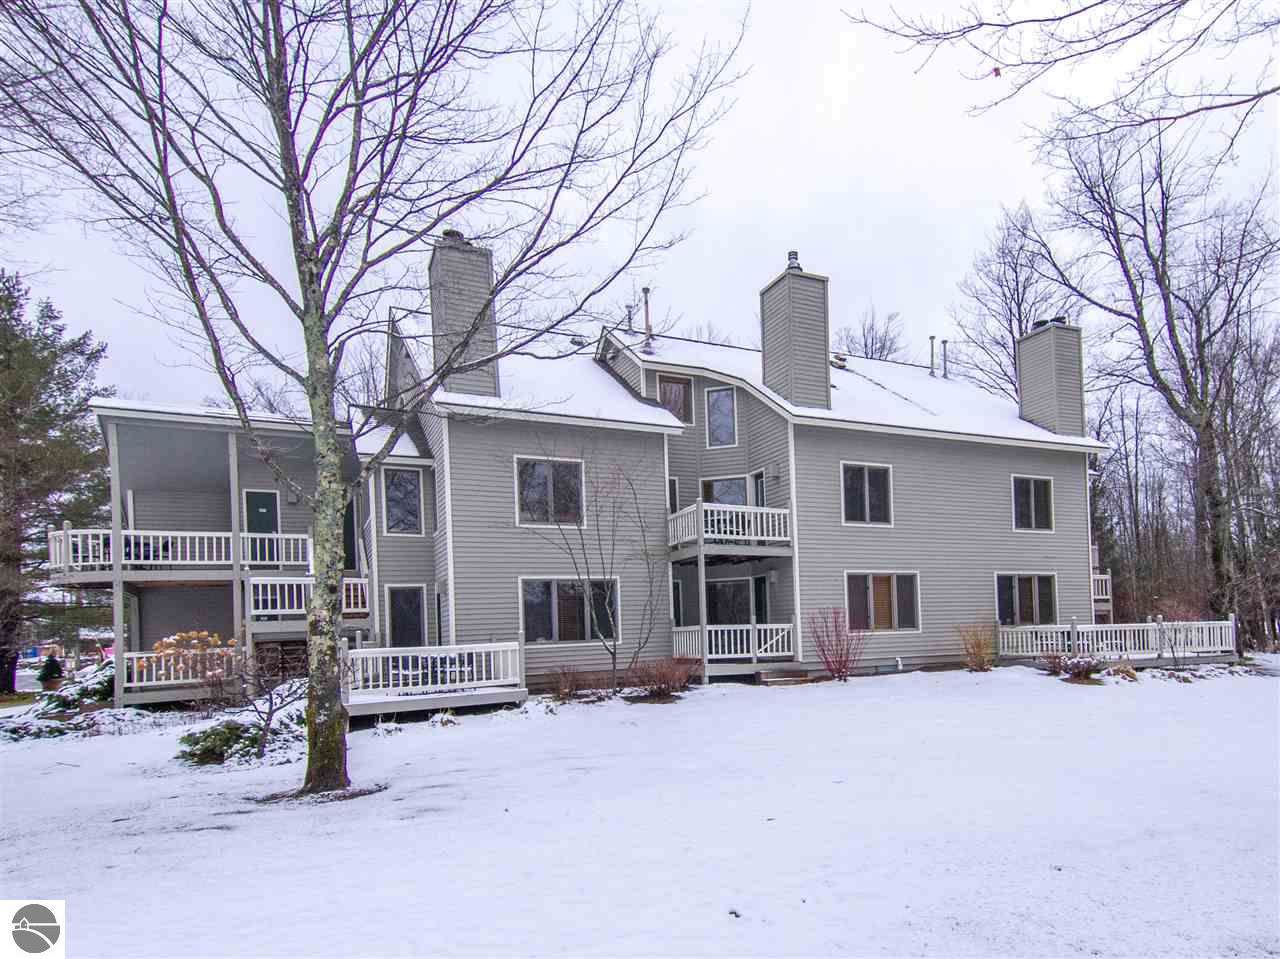 12495-Unit 529 Wintergreen Drive - Photo 1